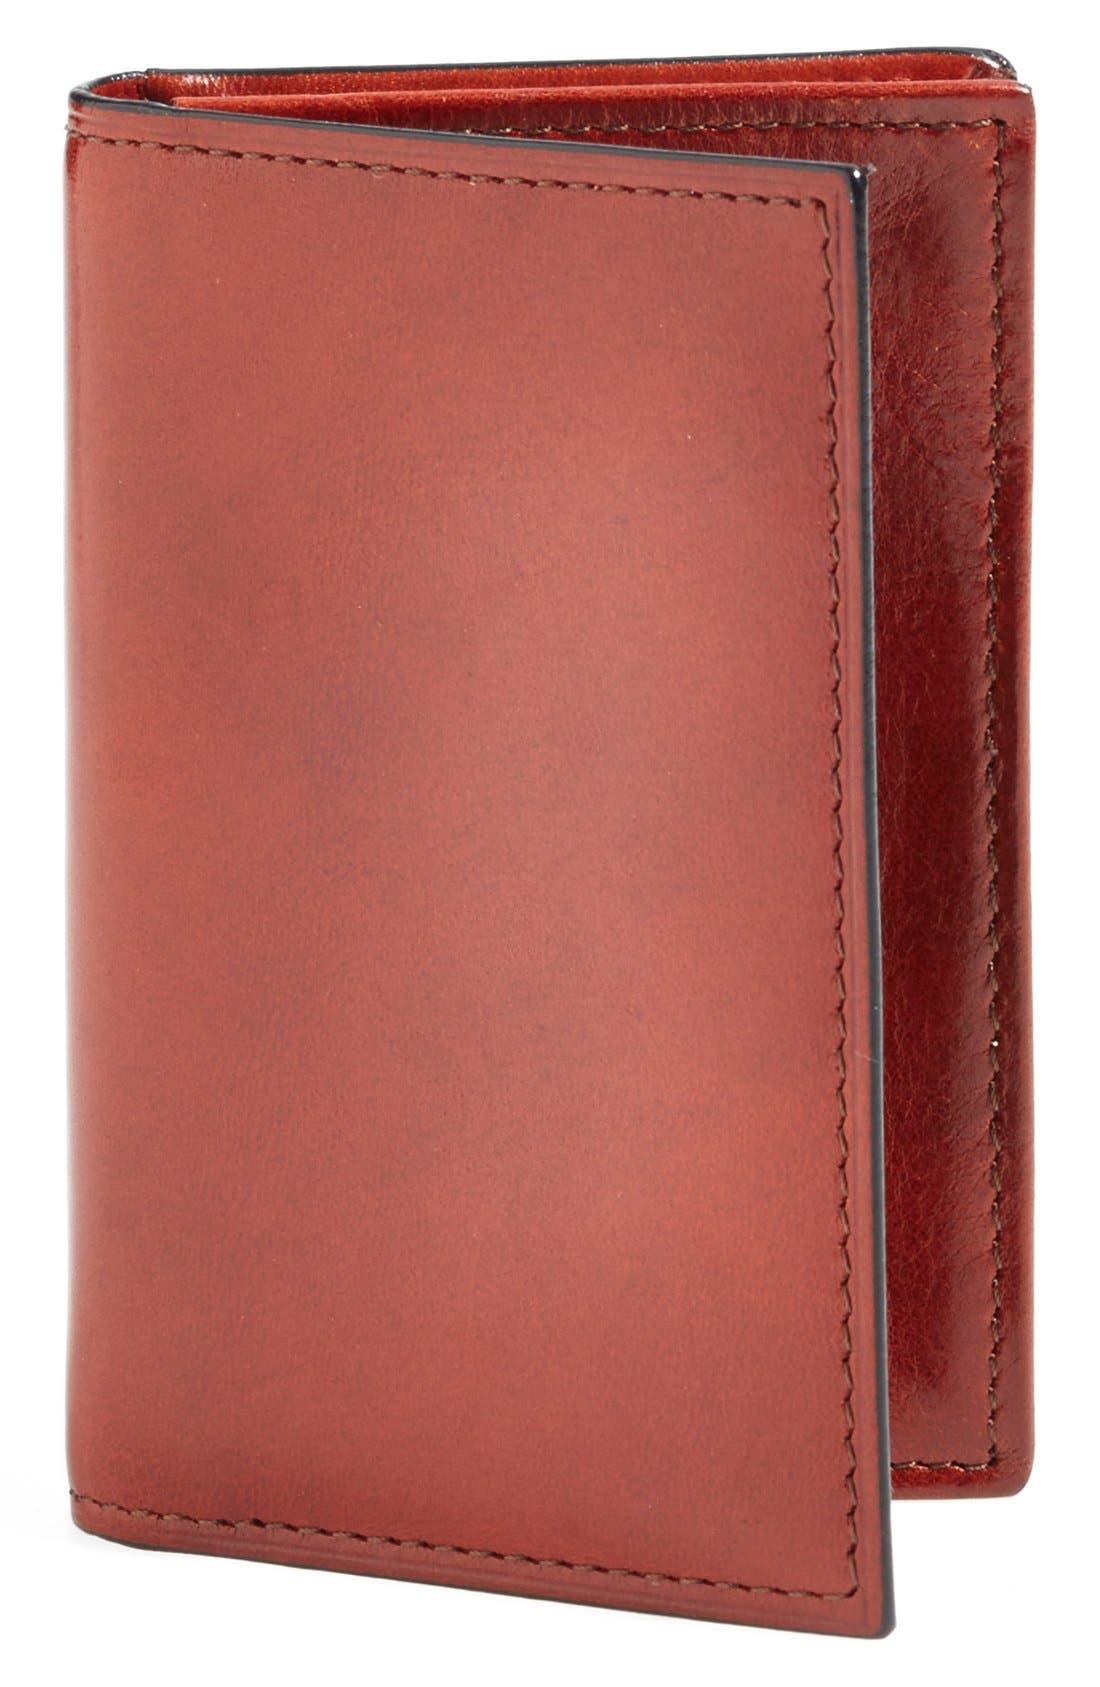 Alternate Image 1 Selected - Bosca 'Old Leather' Gusset Wallet